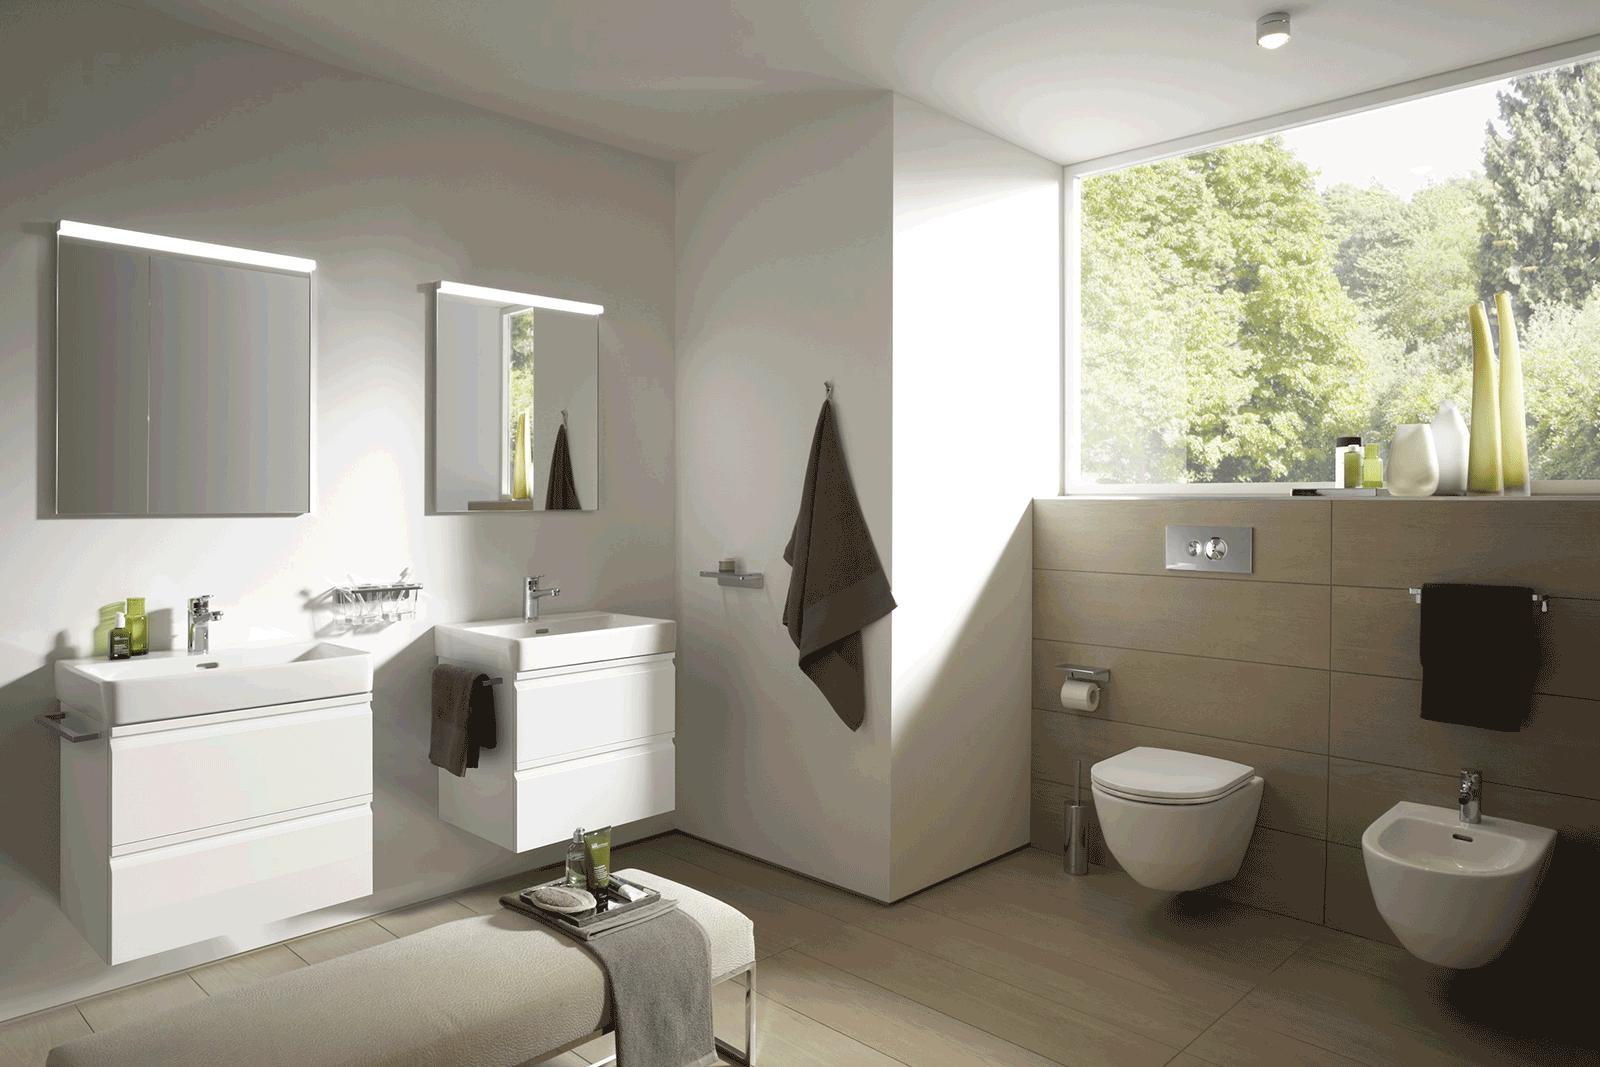 Laufen-pro-s-bathroom